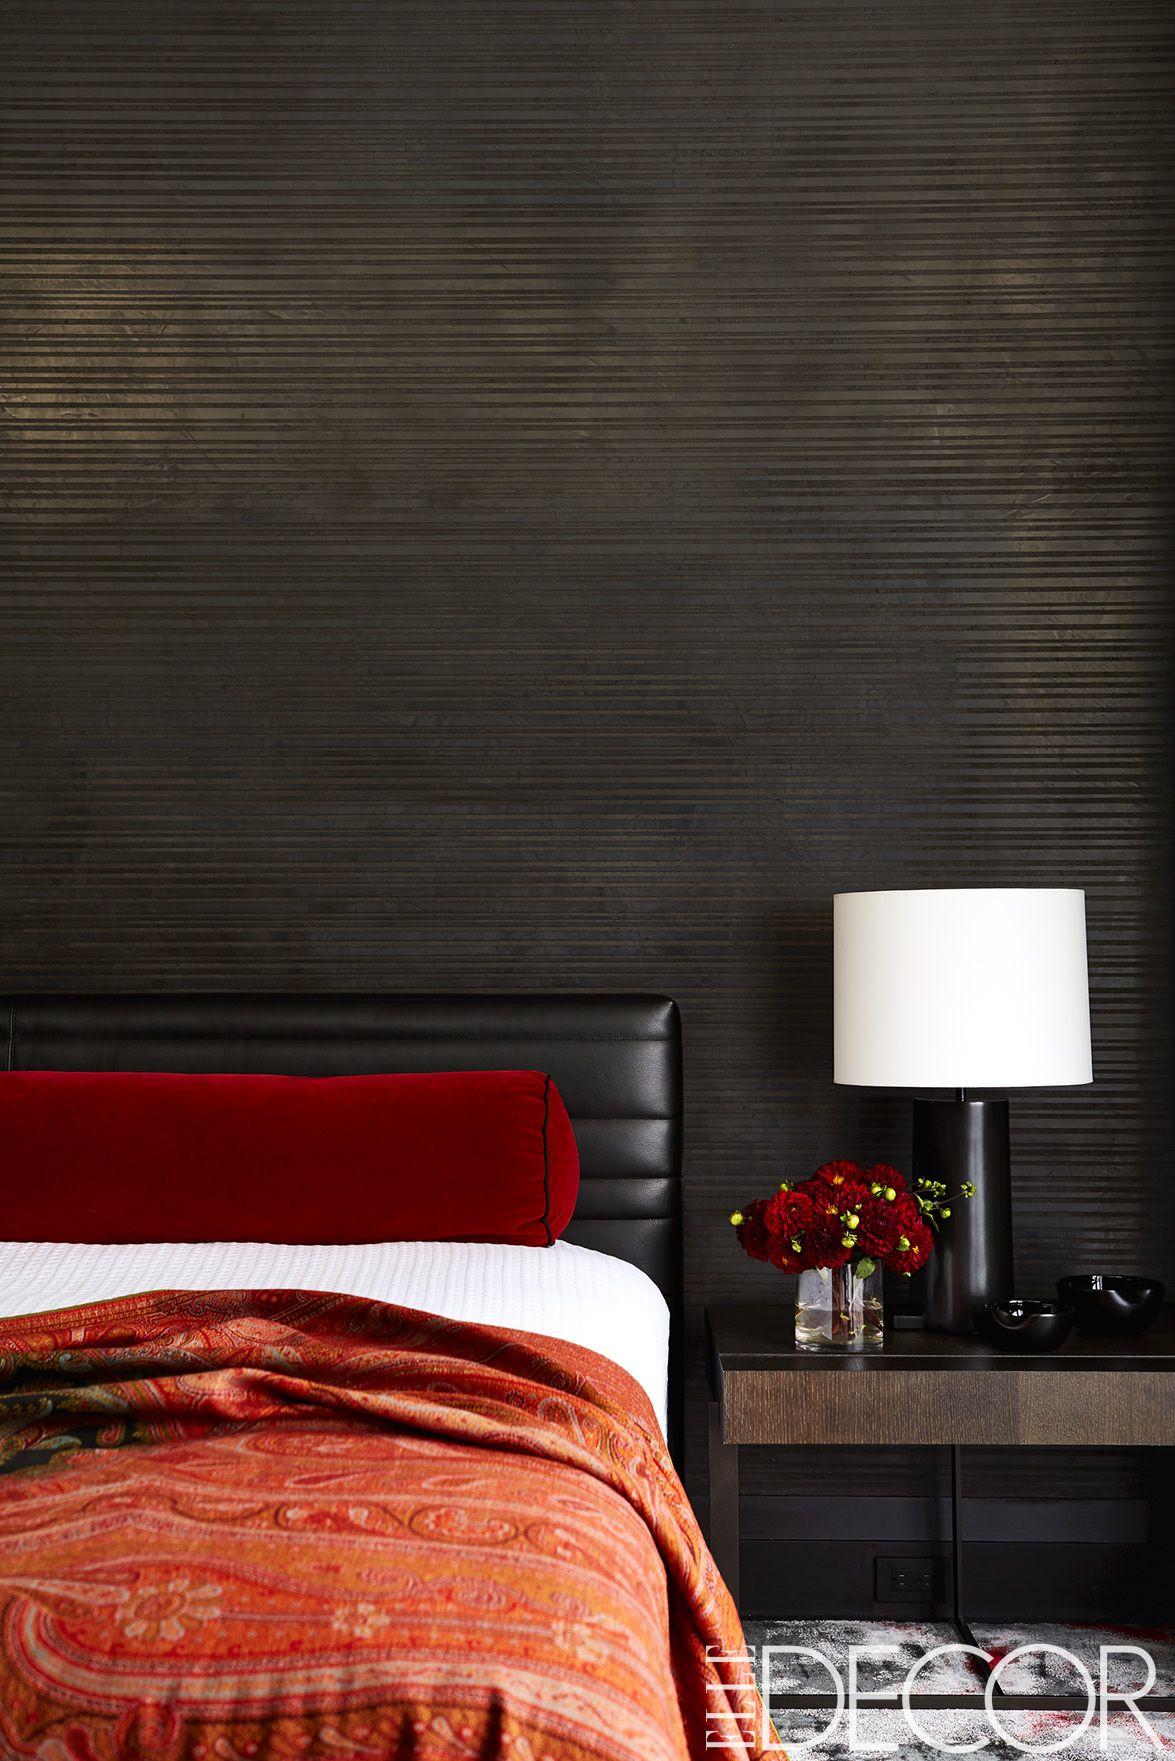 Double Rideaux Style Chalet 30+ minimalist bedroom decor ideas - modern designs for